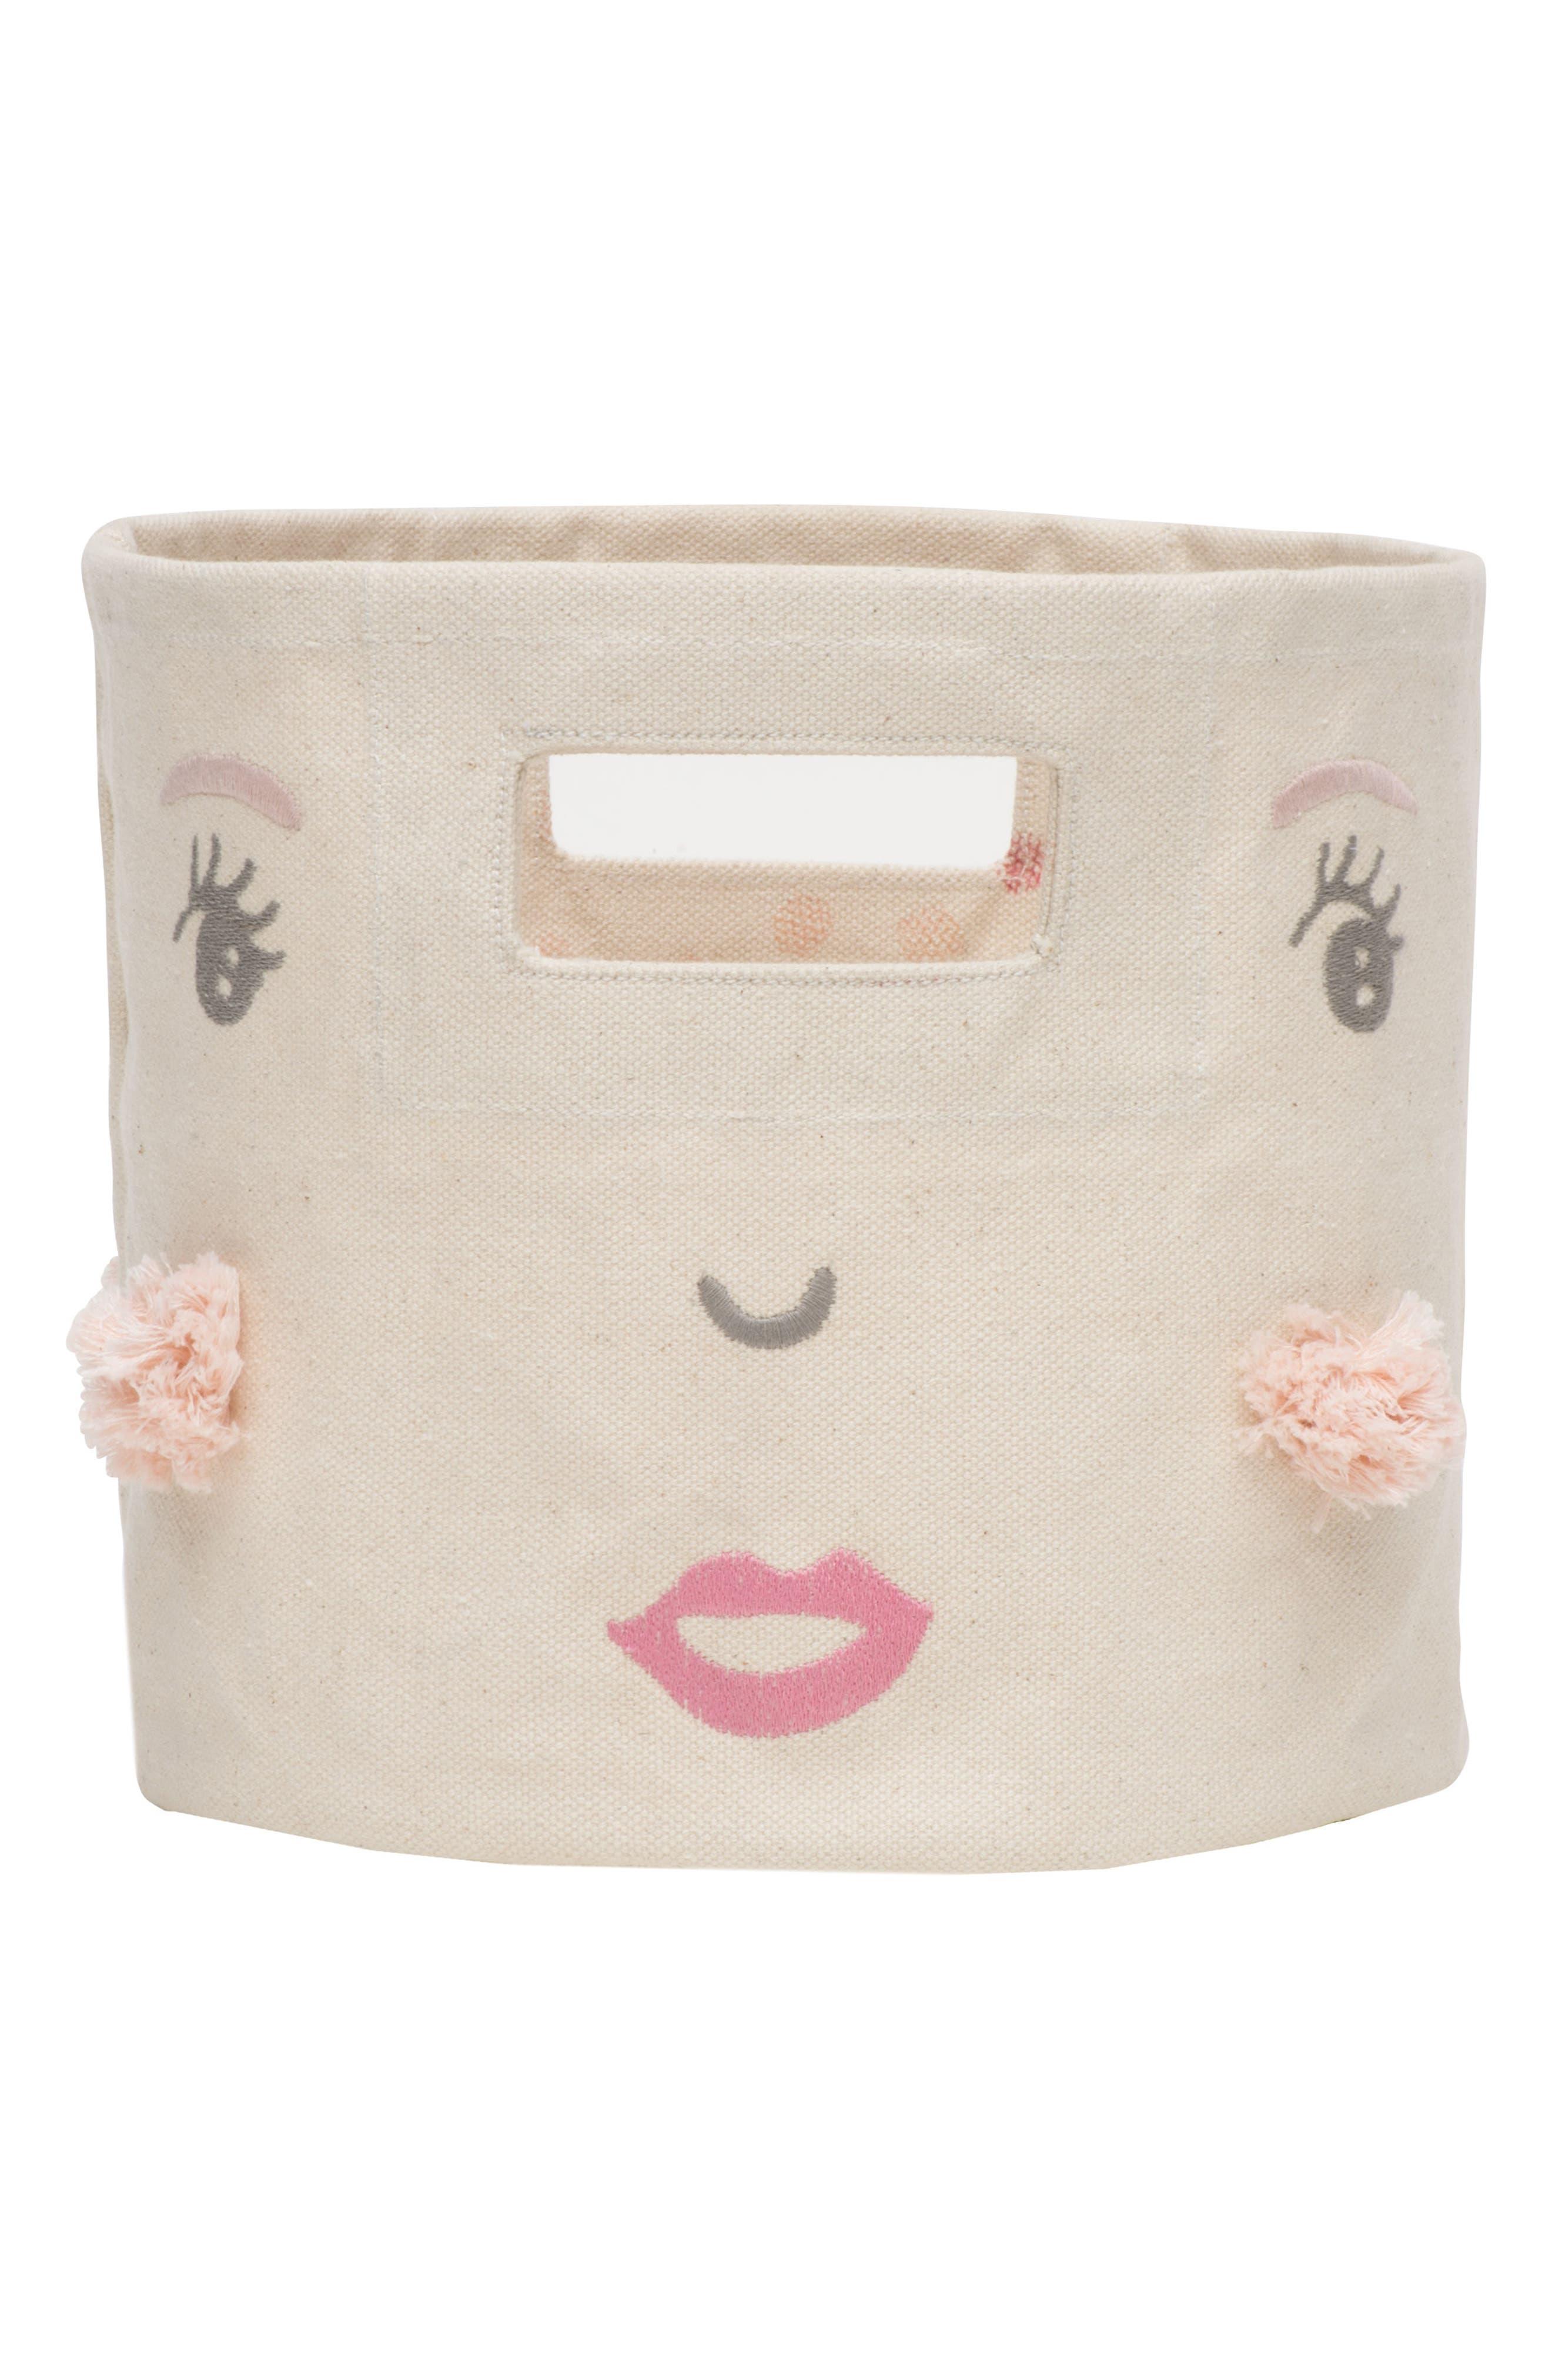 Peek-A-Boo Girl Mini Canvas Bin,                         Main,                         color, Ivory